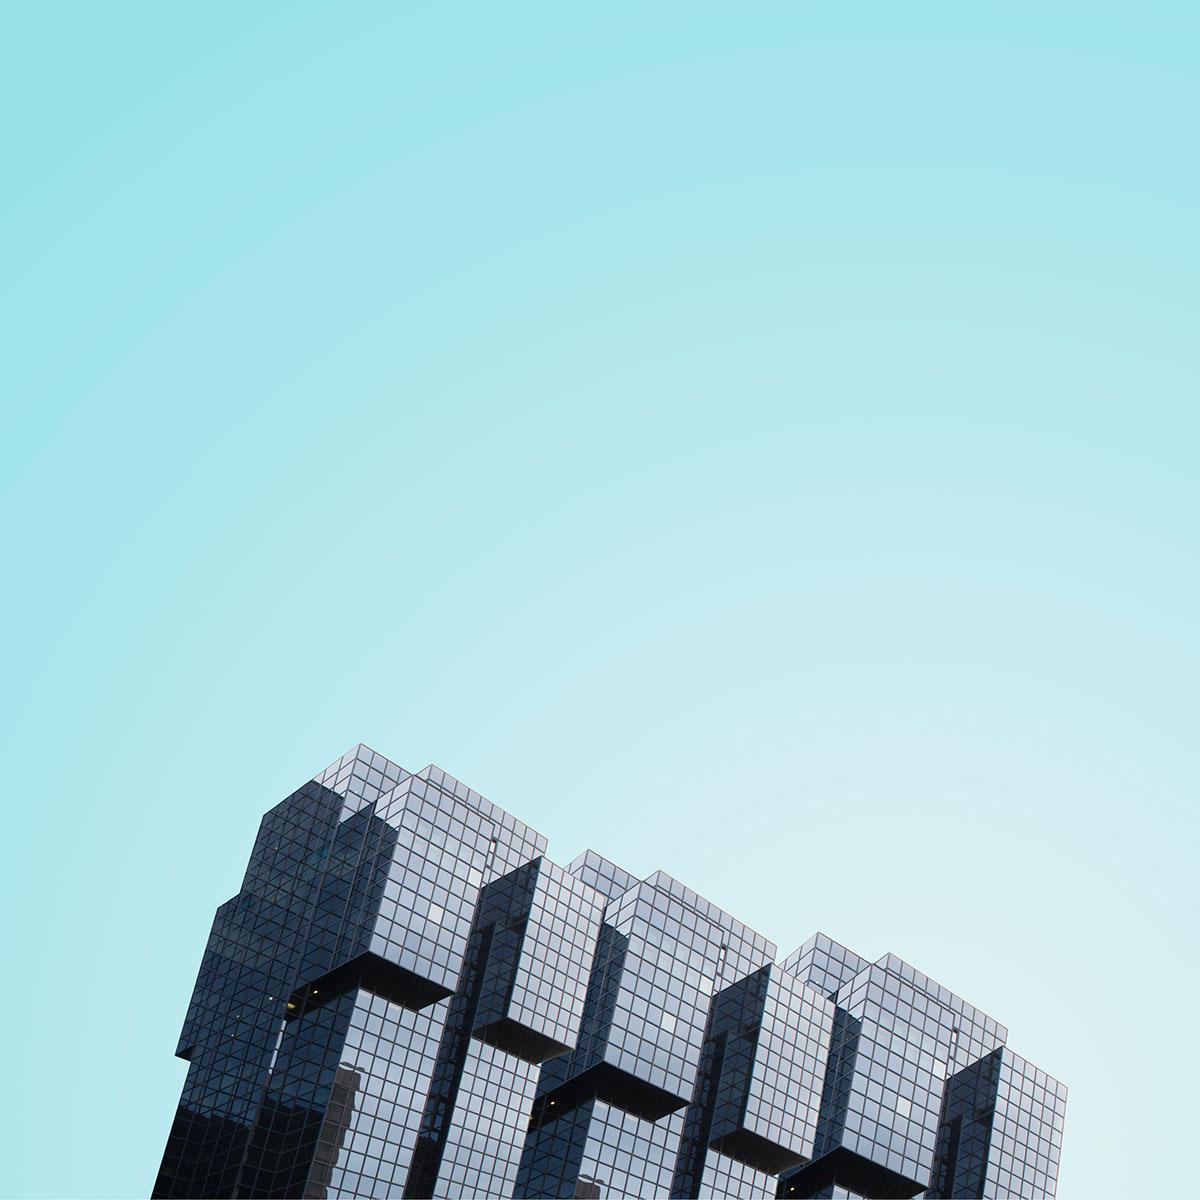 London minimal building gradient Minimalism skyscraper city architecture